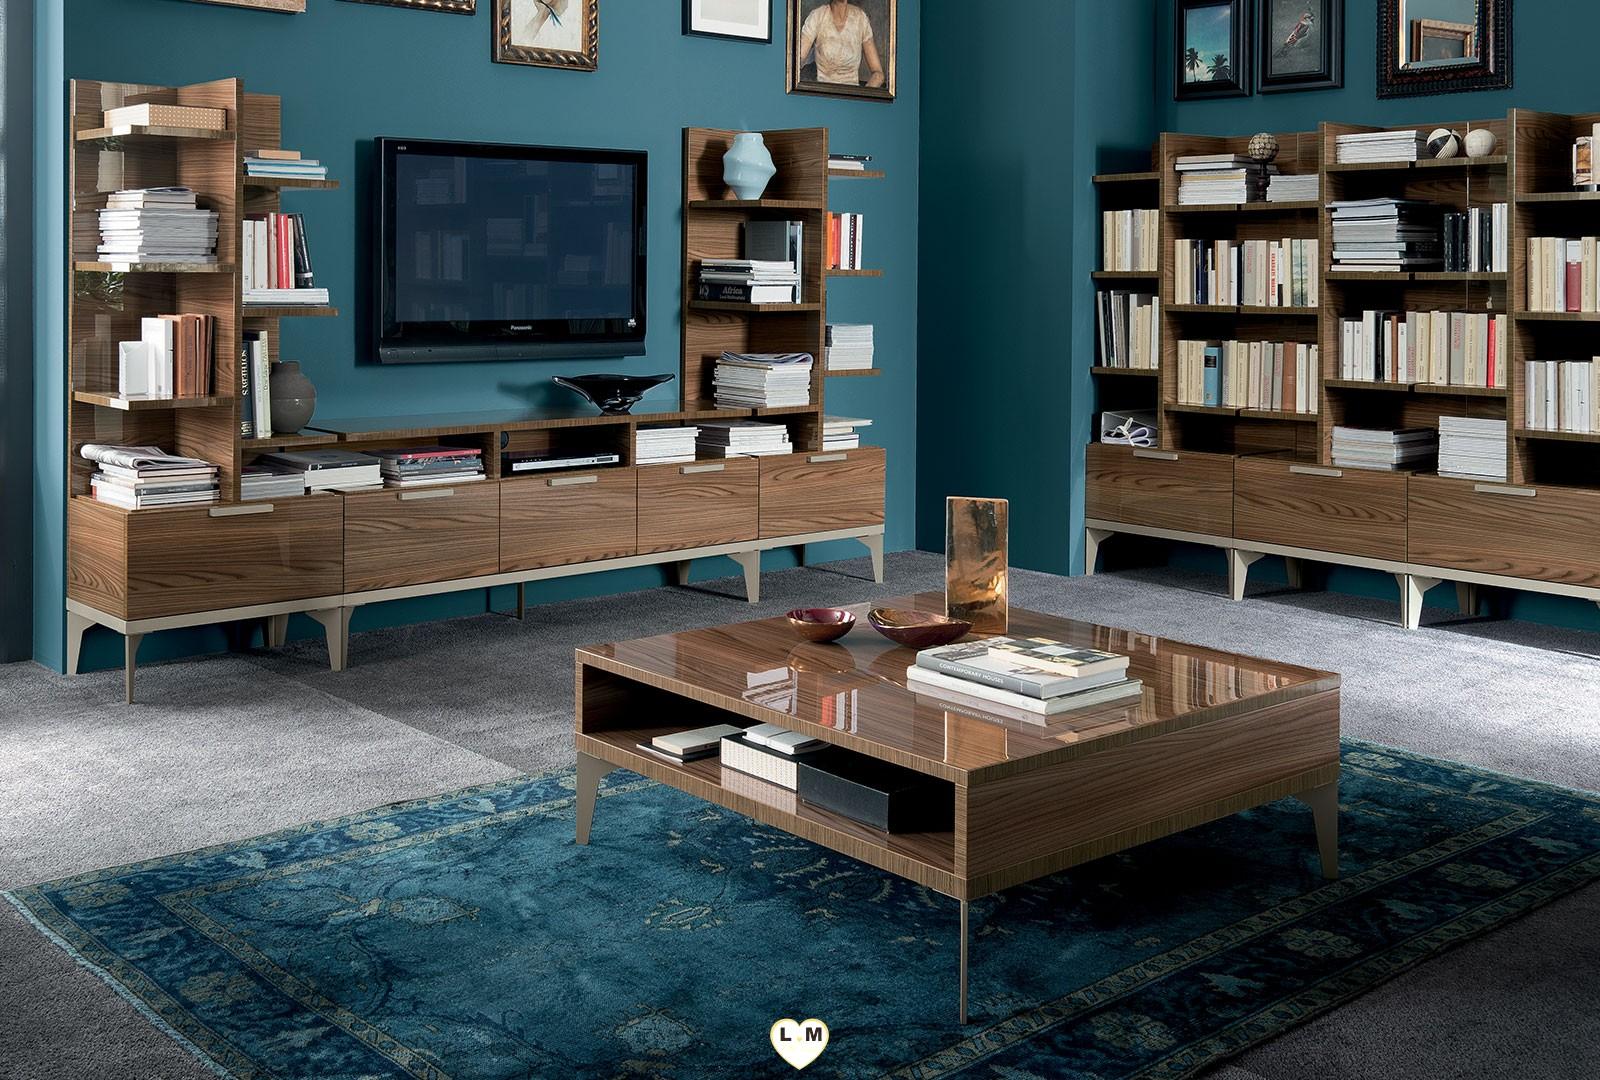 newport laque orme vanille brillant ensemble sejour salle. Black Bedroom Furniture Sets. Home Design Ideas